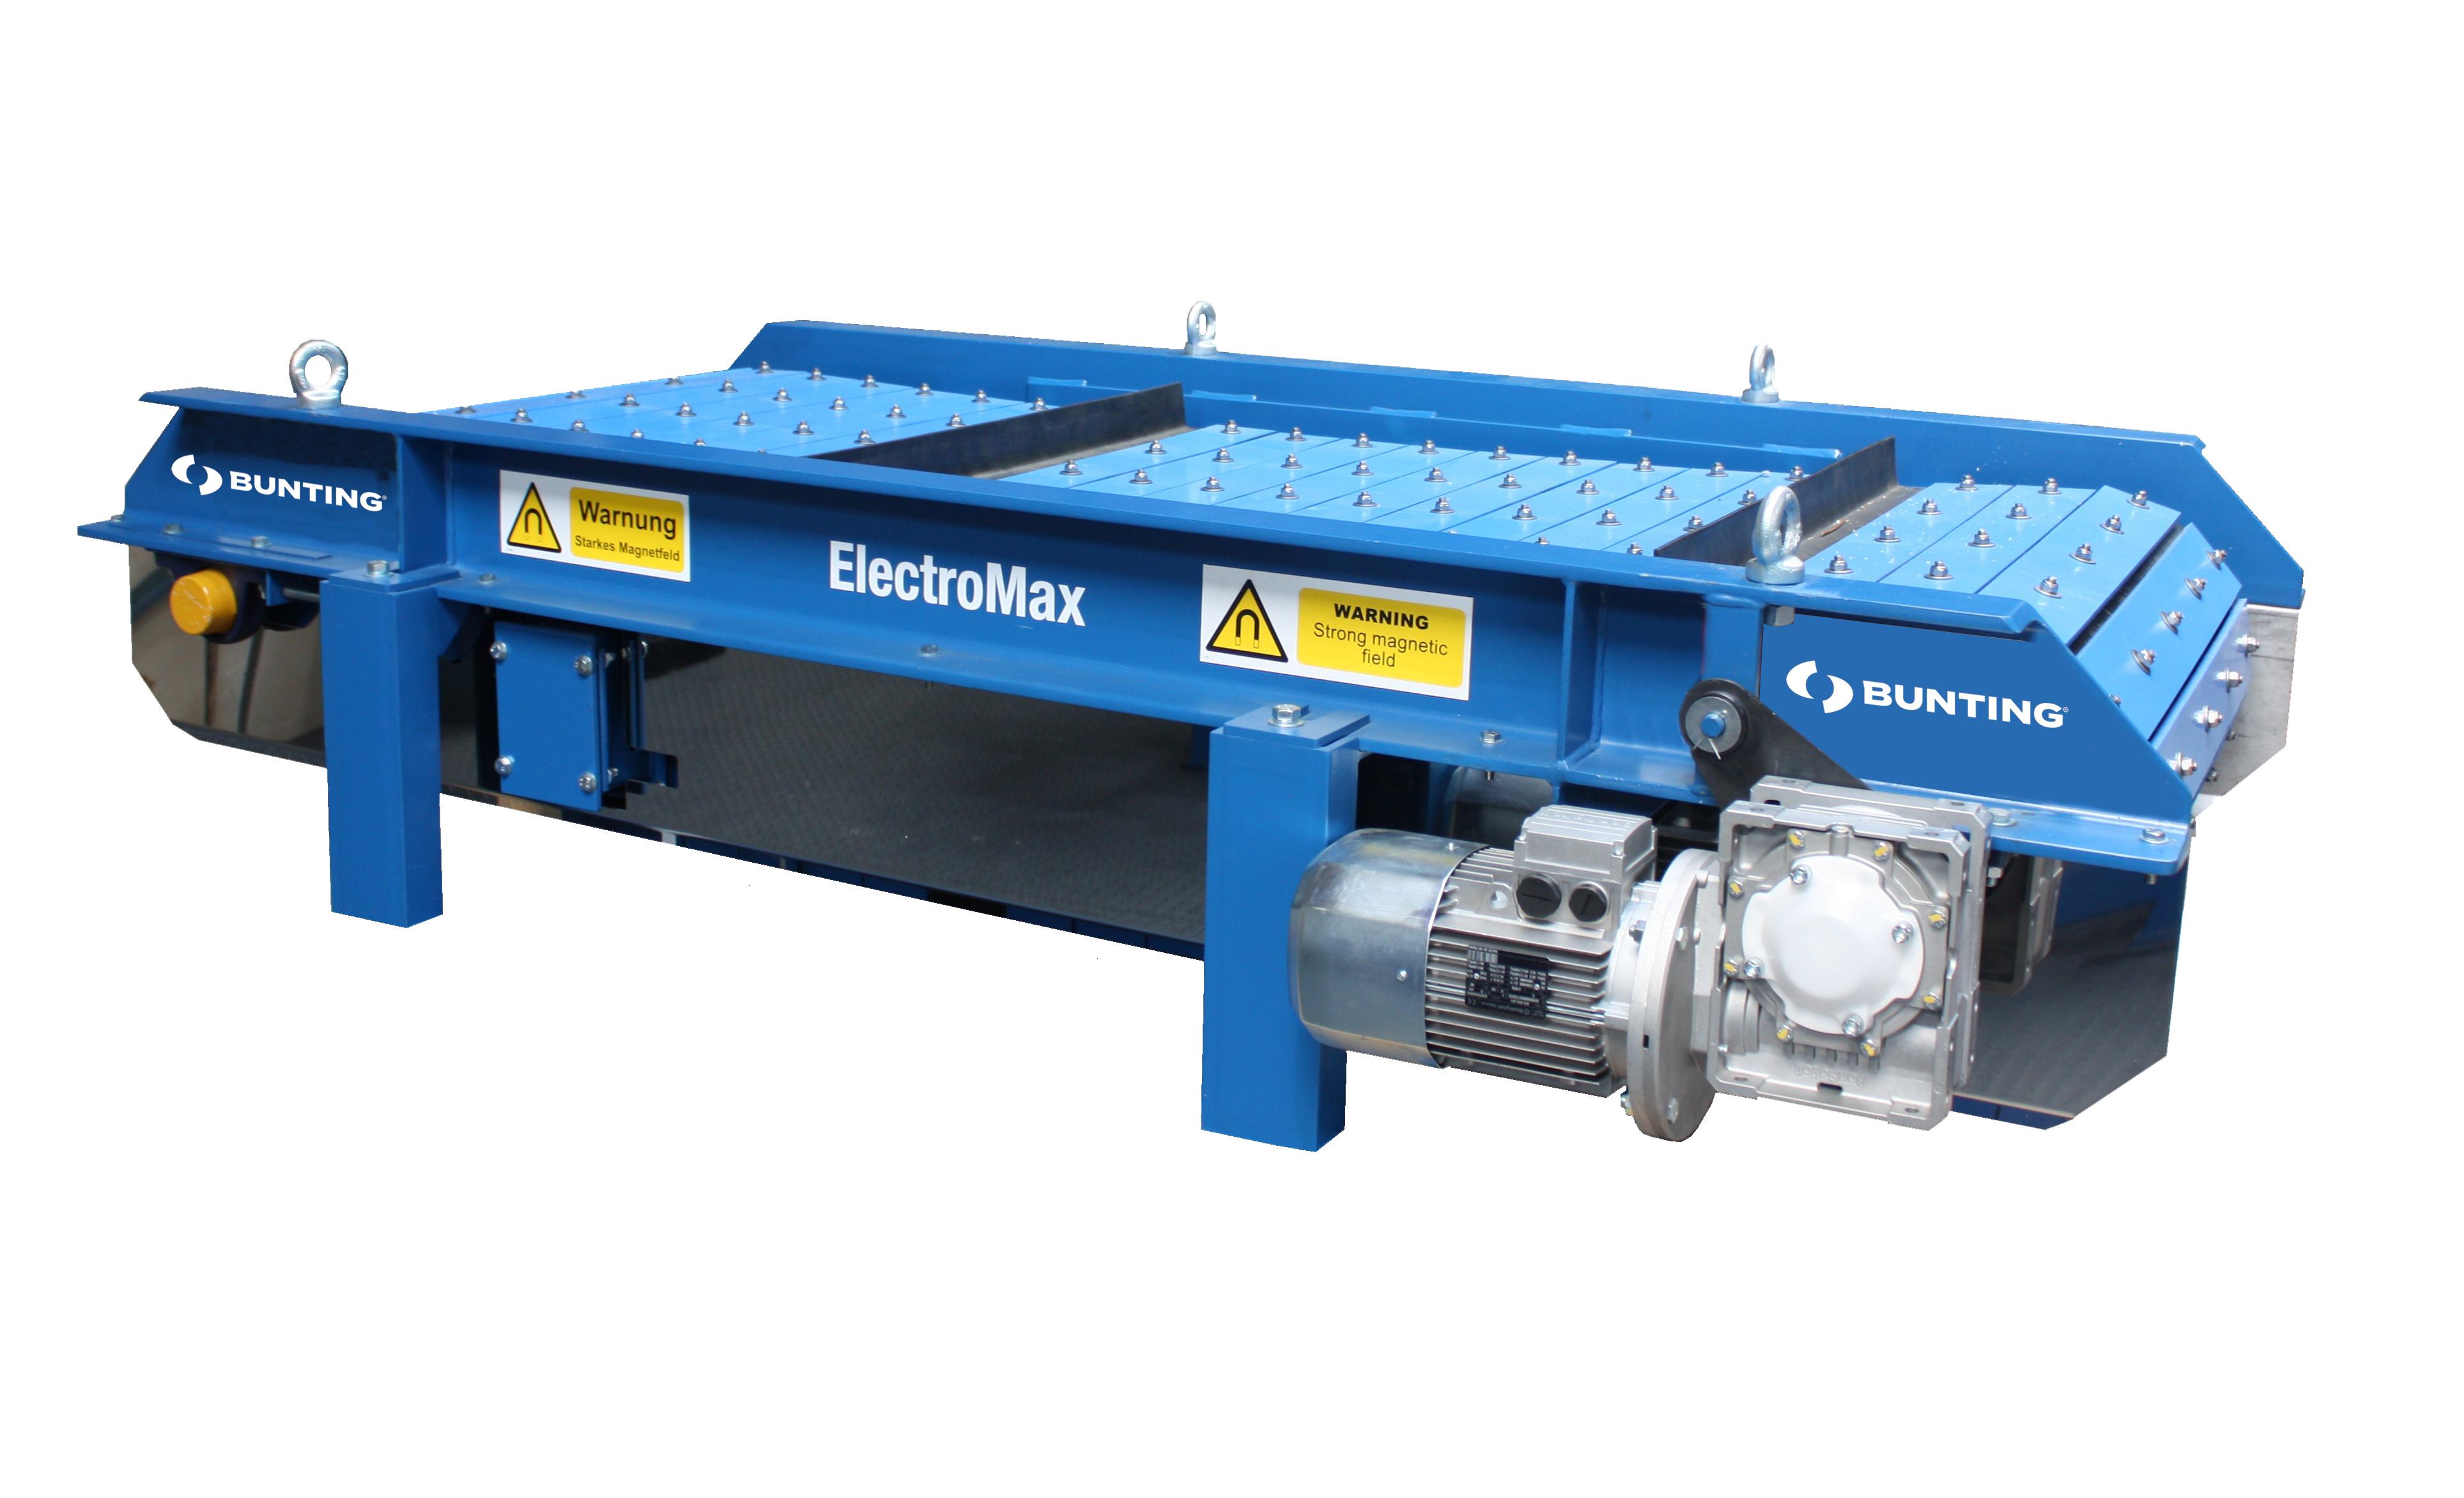 ElectroMax Crossbelt Magnetic Separator electromax1-blue-bunting